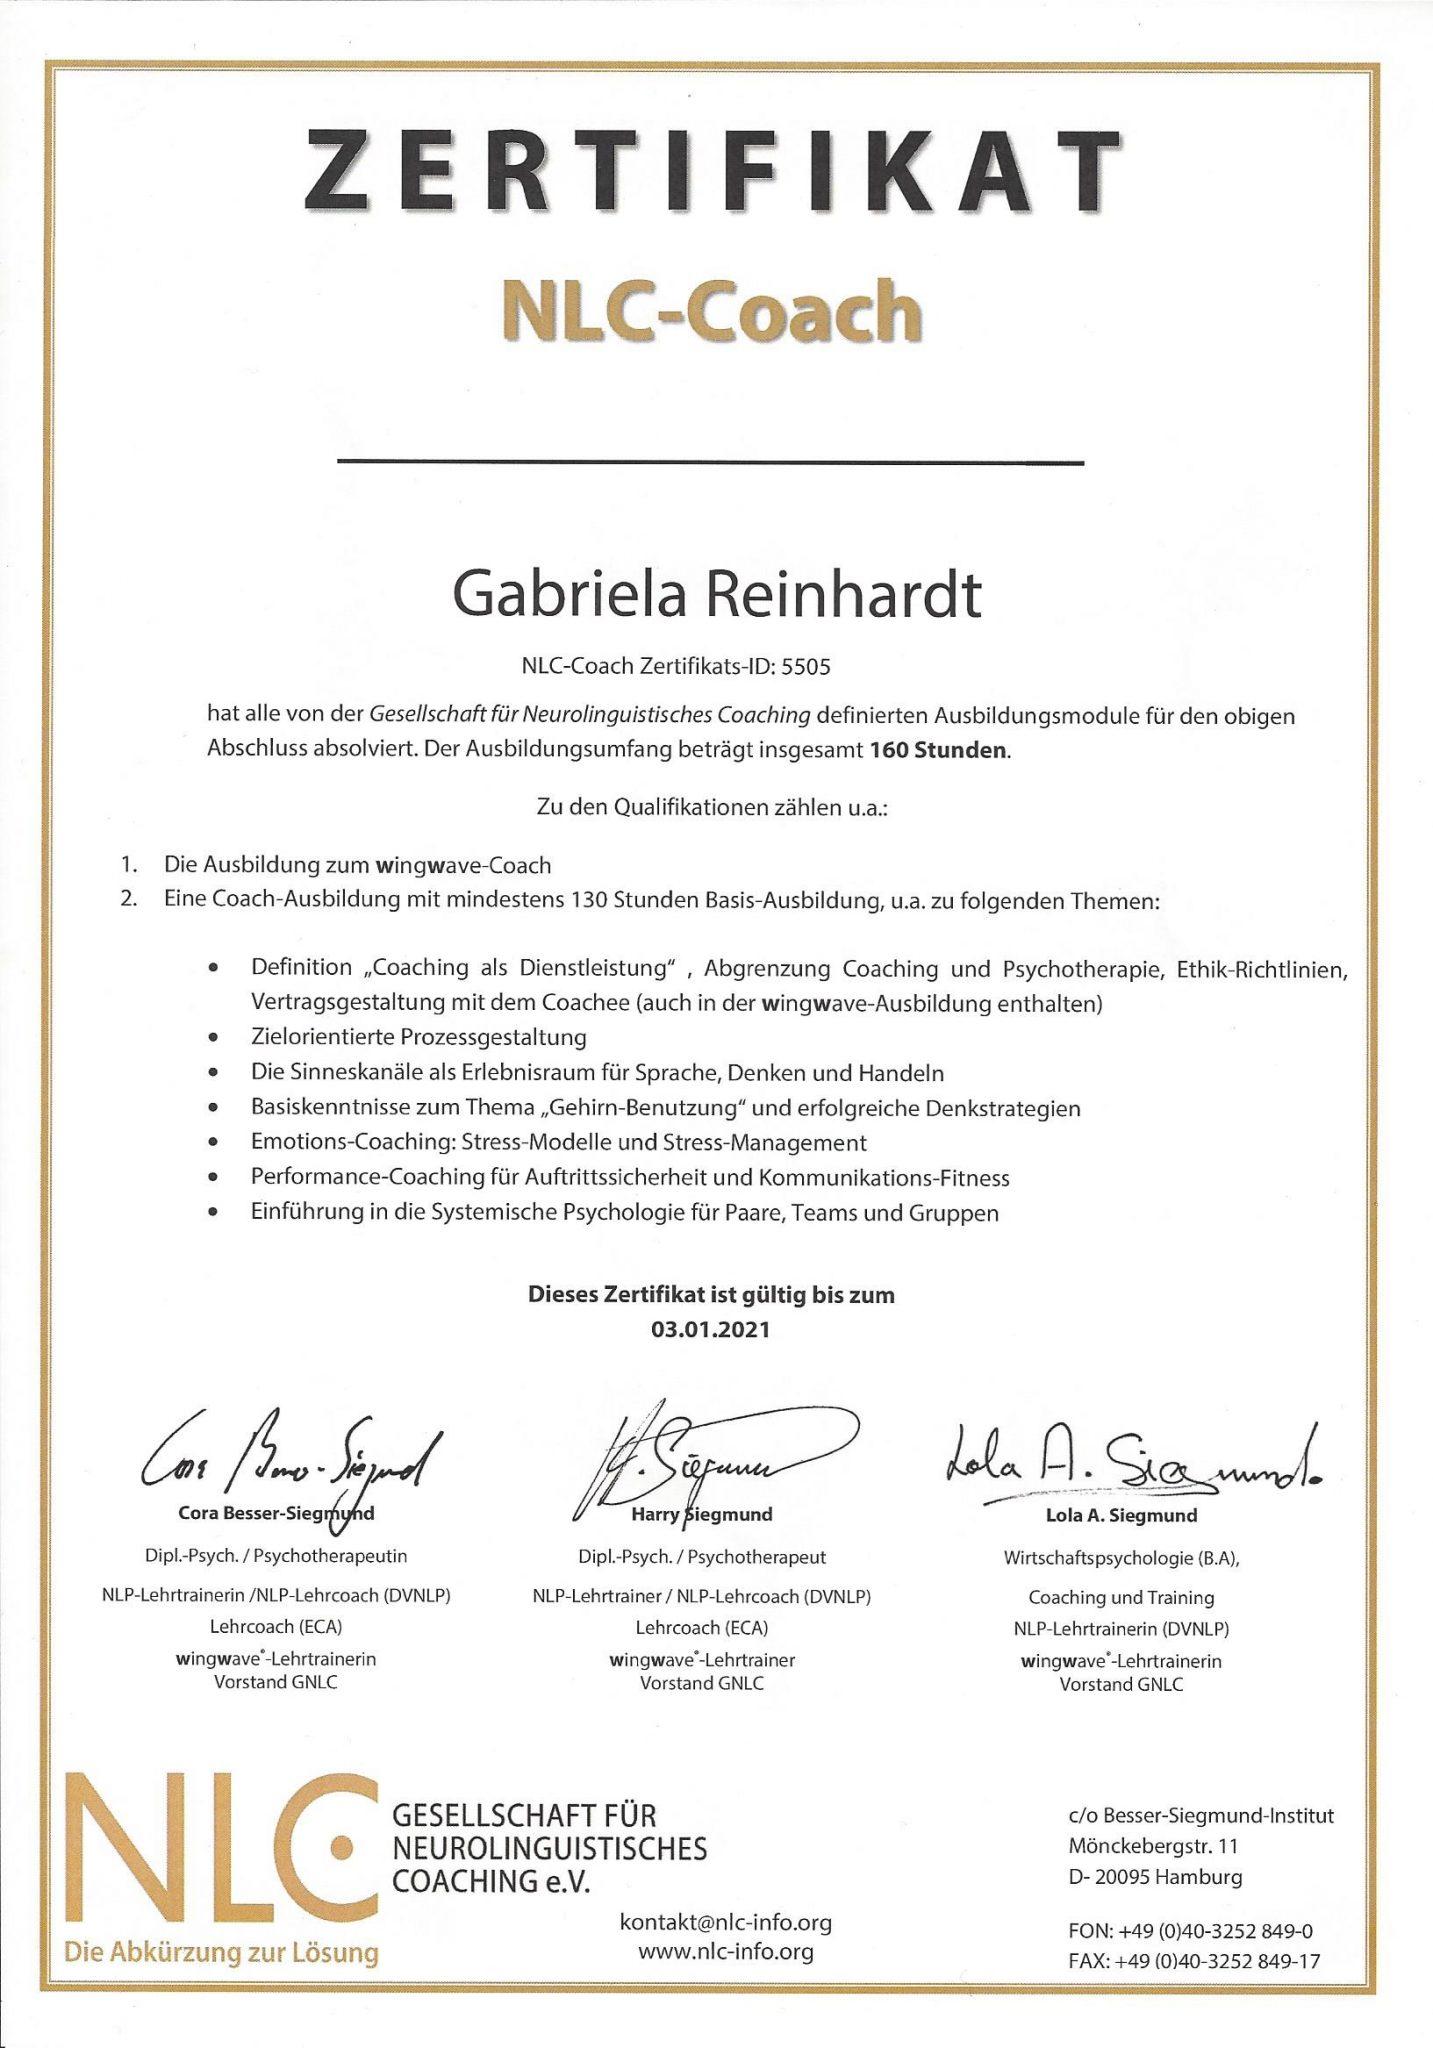 RGH-Consulting | Gabriela Reinhardt | Zertifikate | Zertifikat NLC Coach